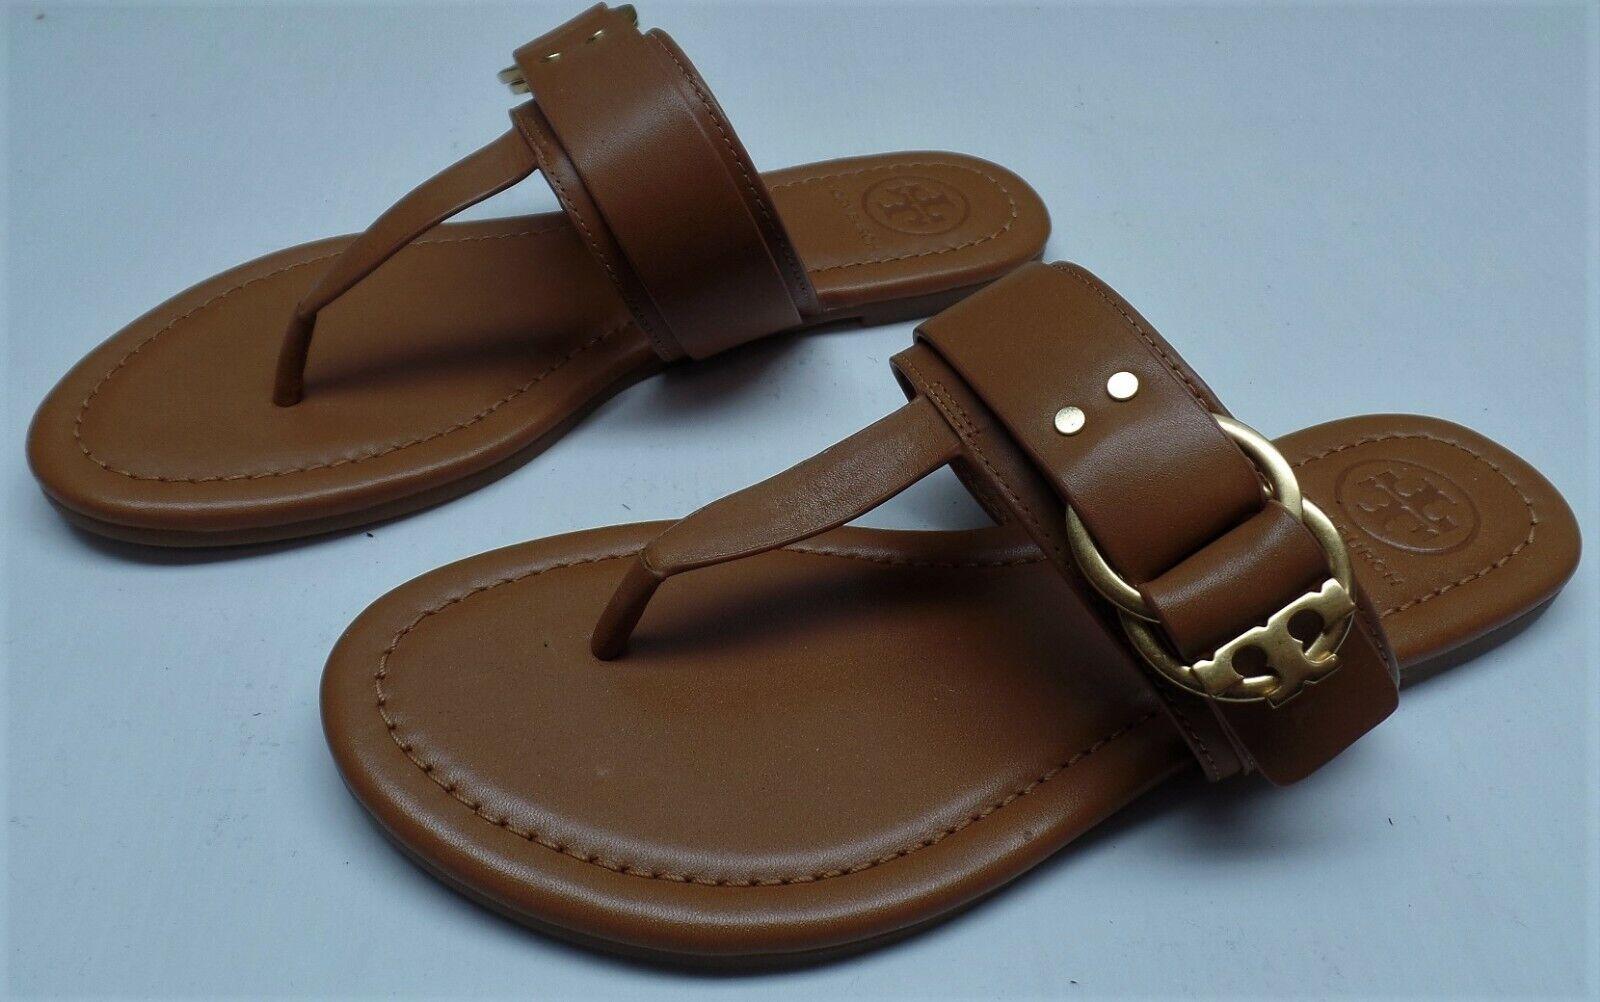 Tory Burch Marsden Flat Thong Sandal in Cognac  - Size 5M -  228